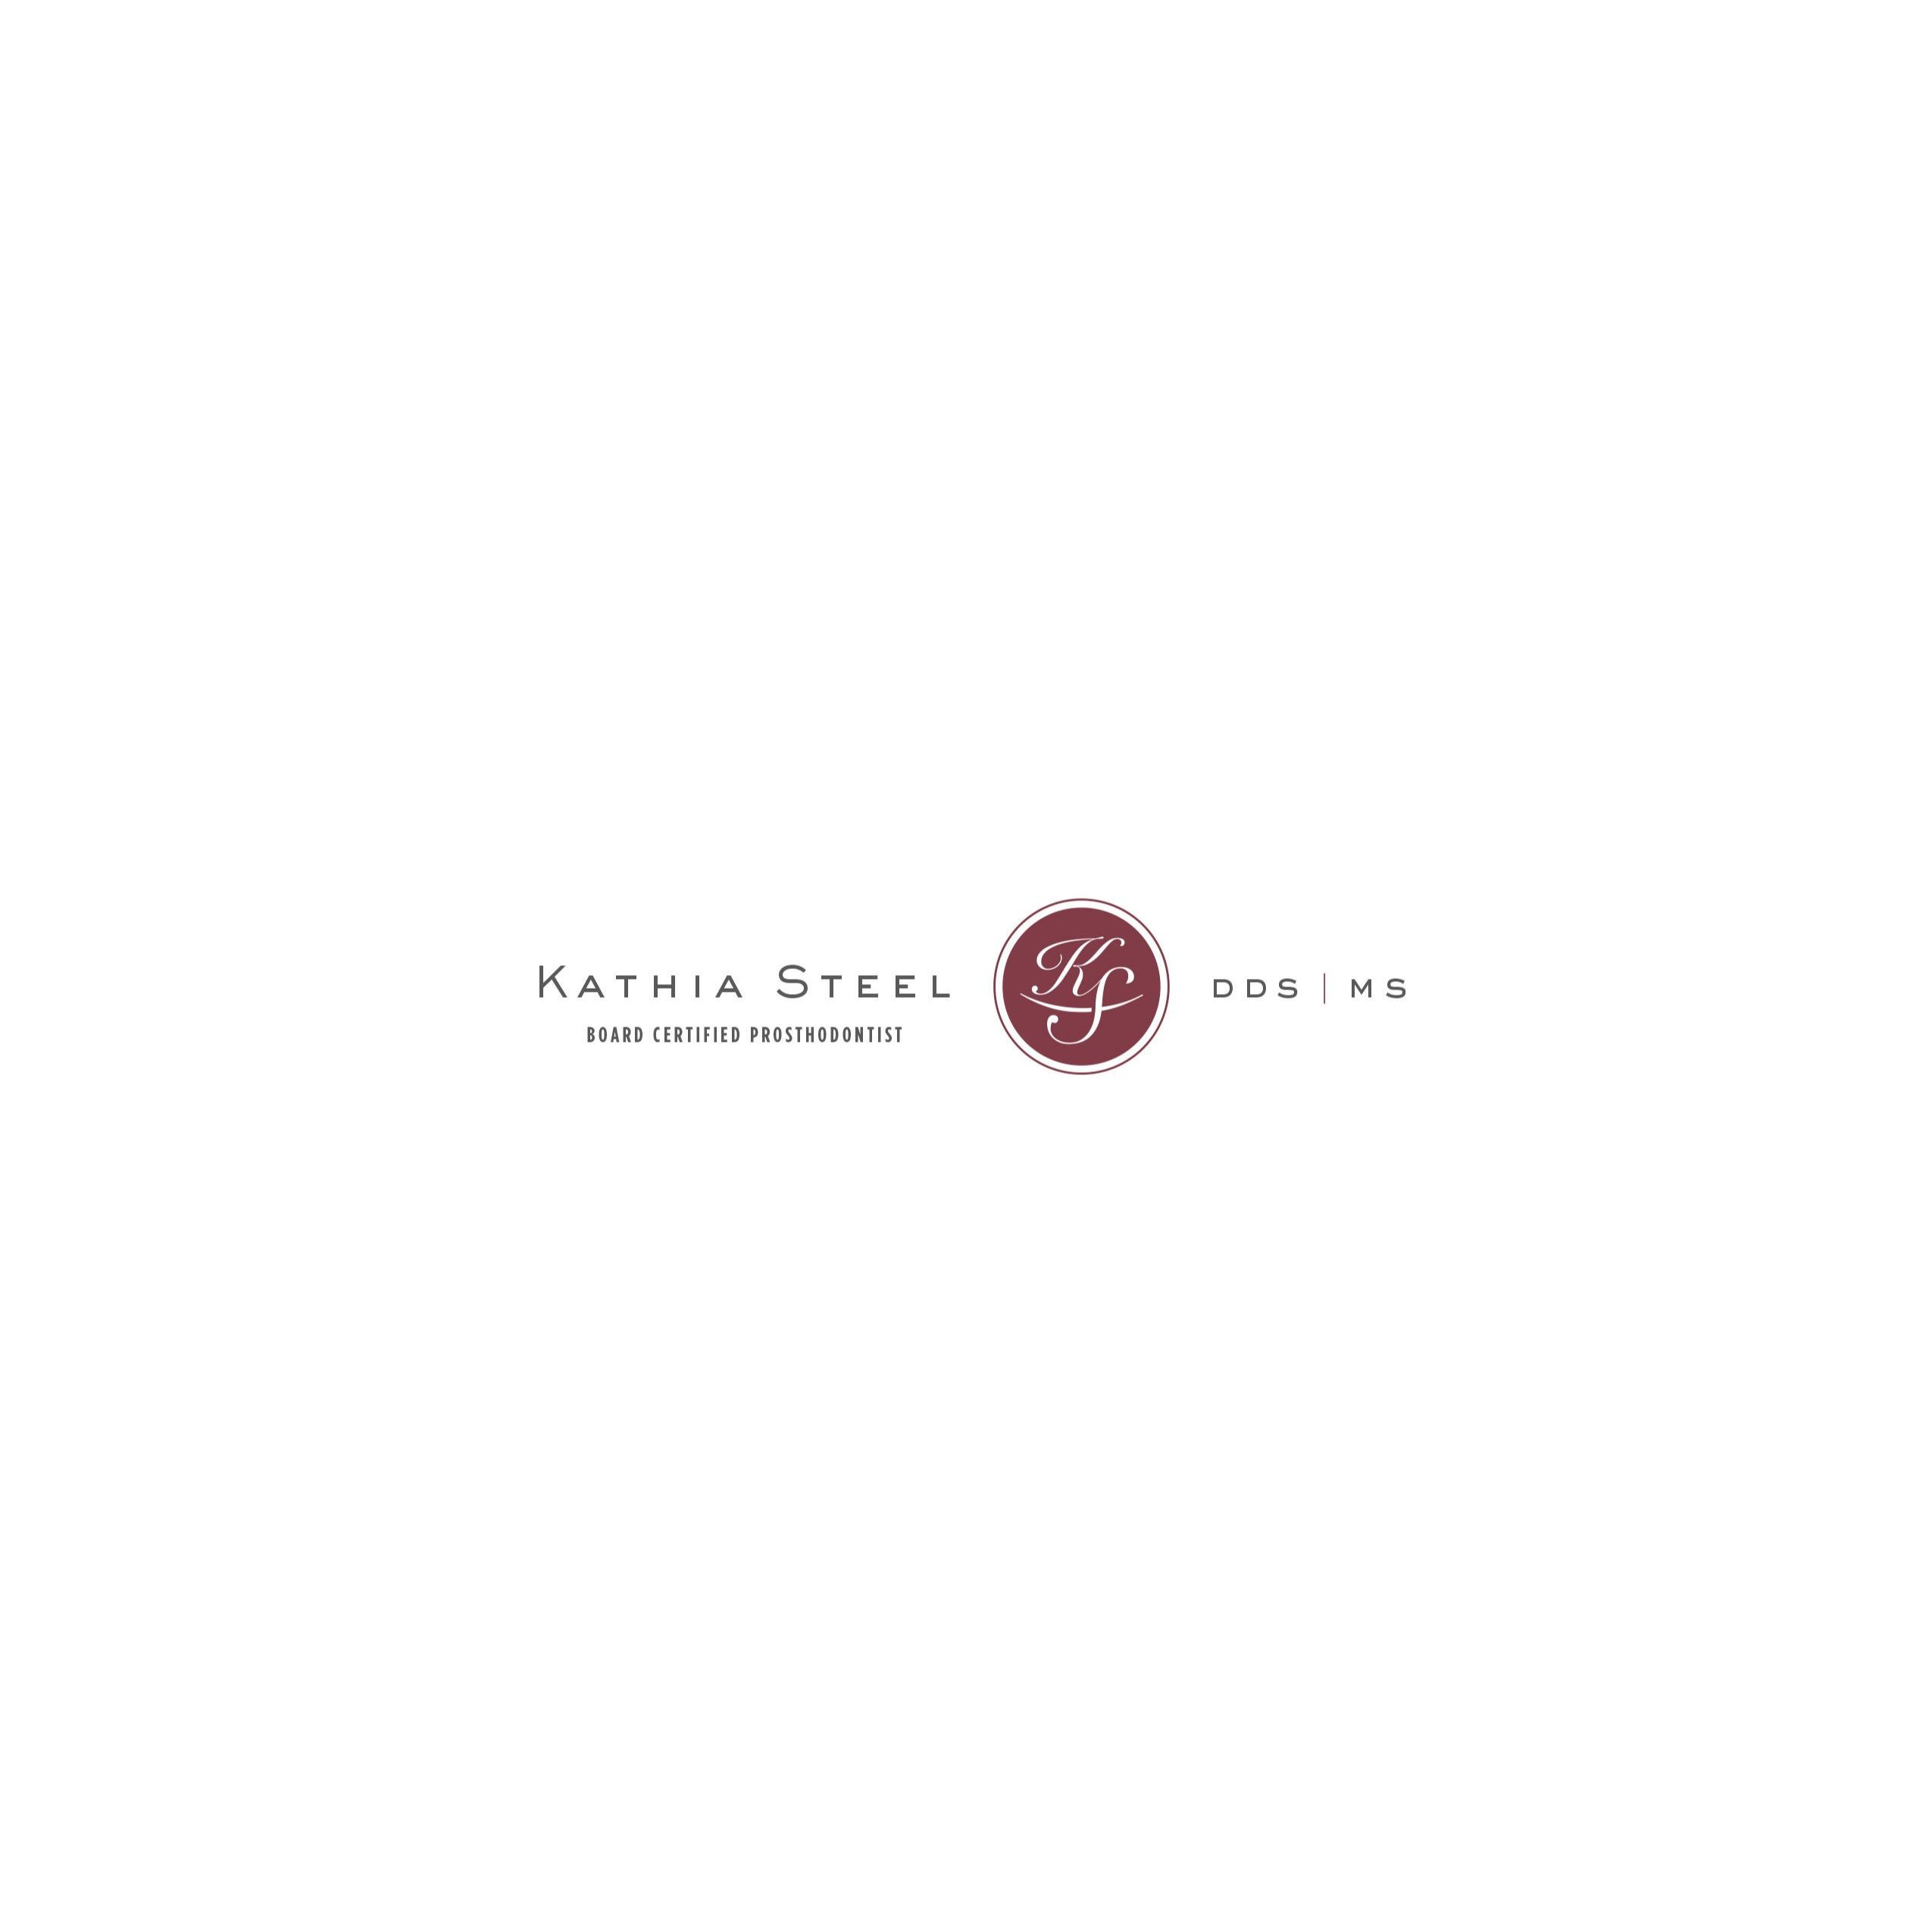 Kathia Steel, DDS, MS - Dallas, TX 75225 - (214)369-9000 | ShowMeLocal.com